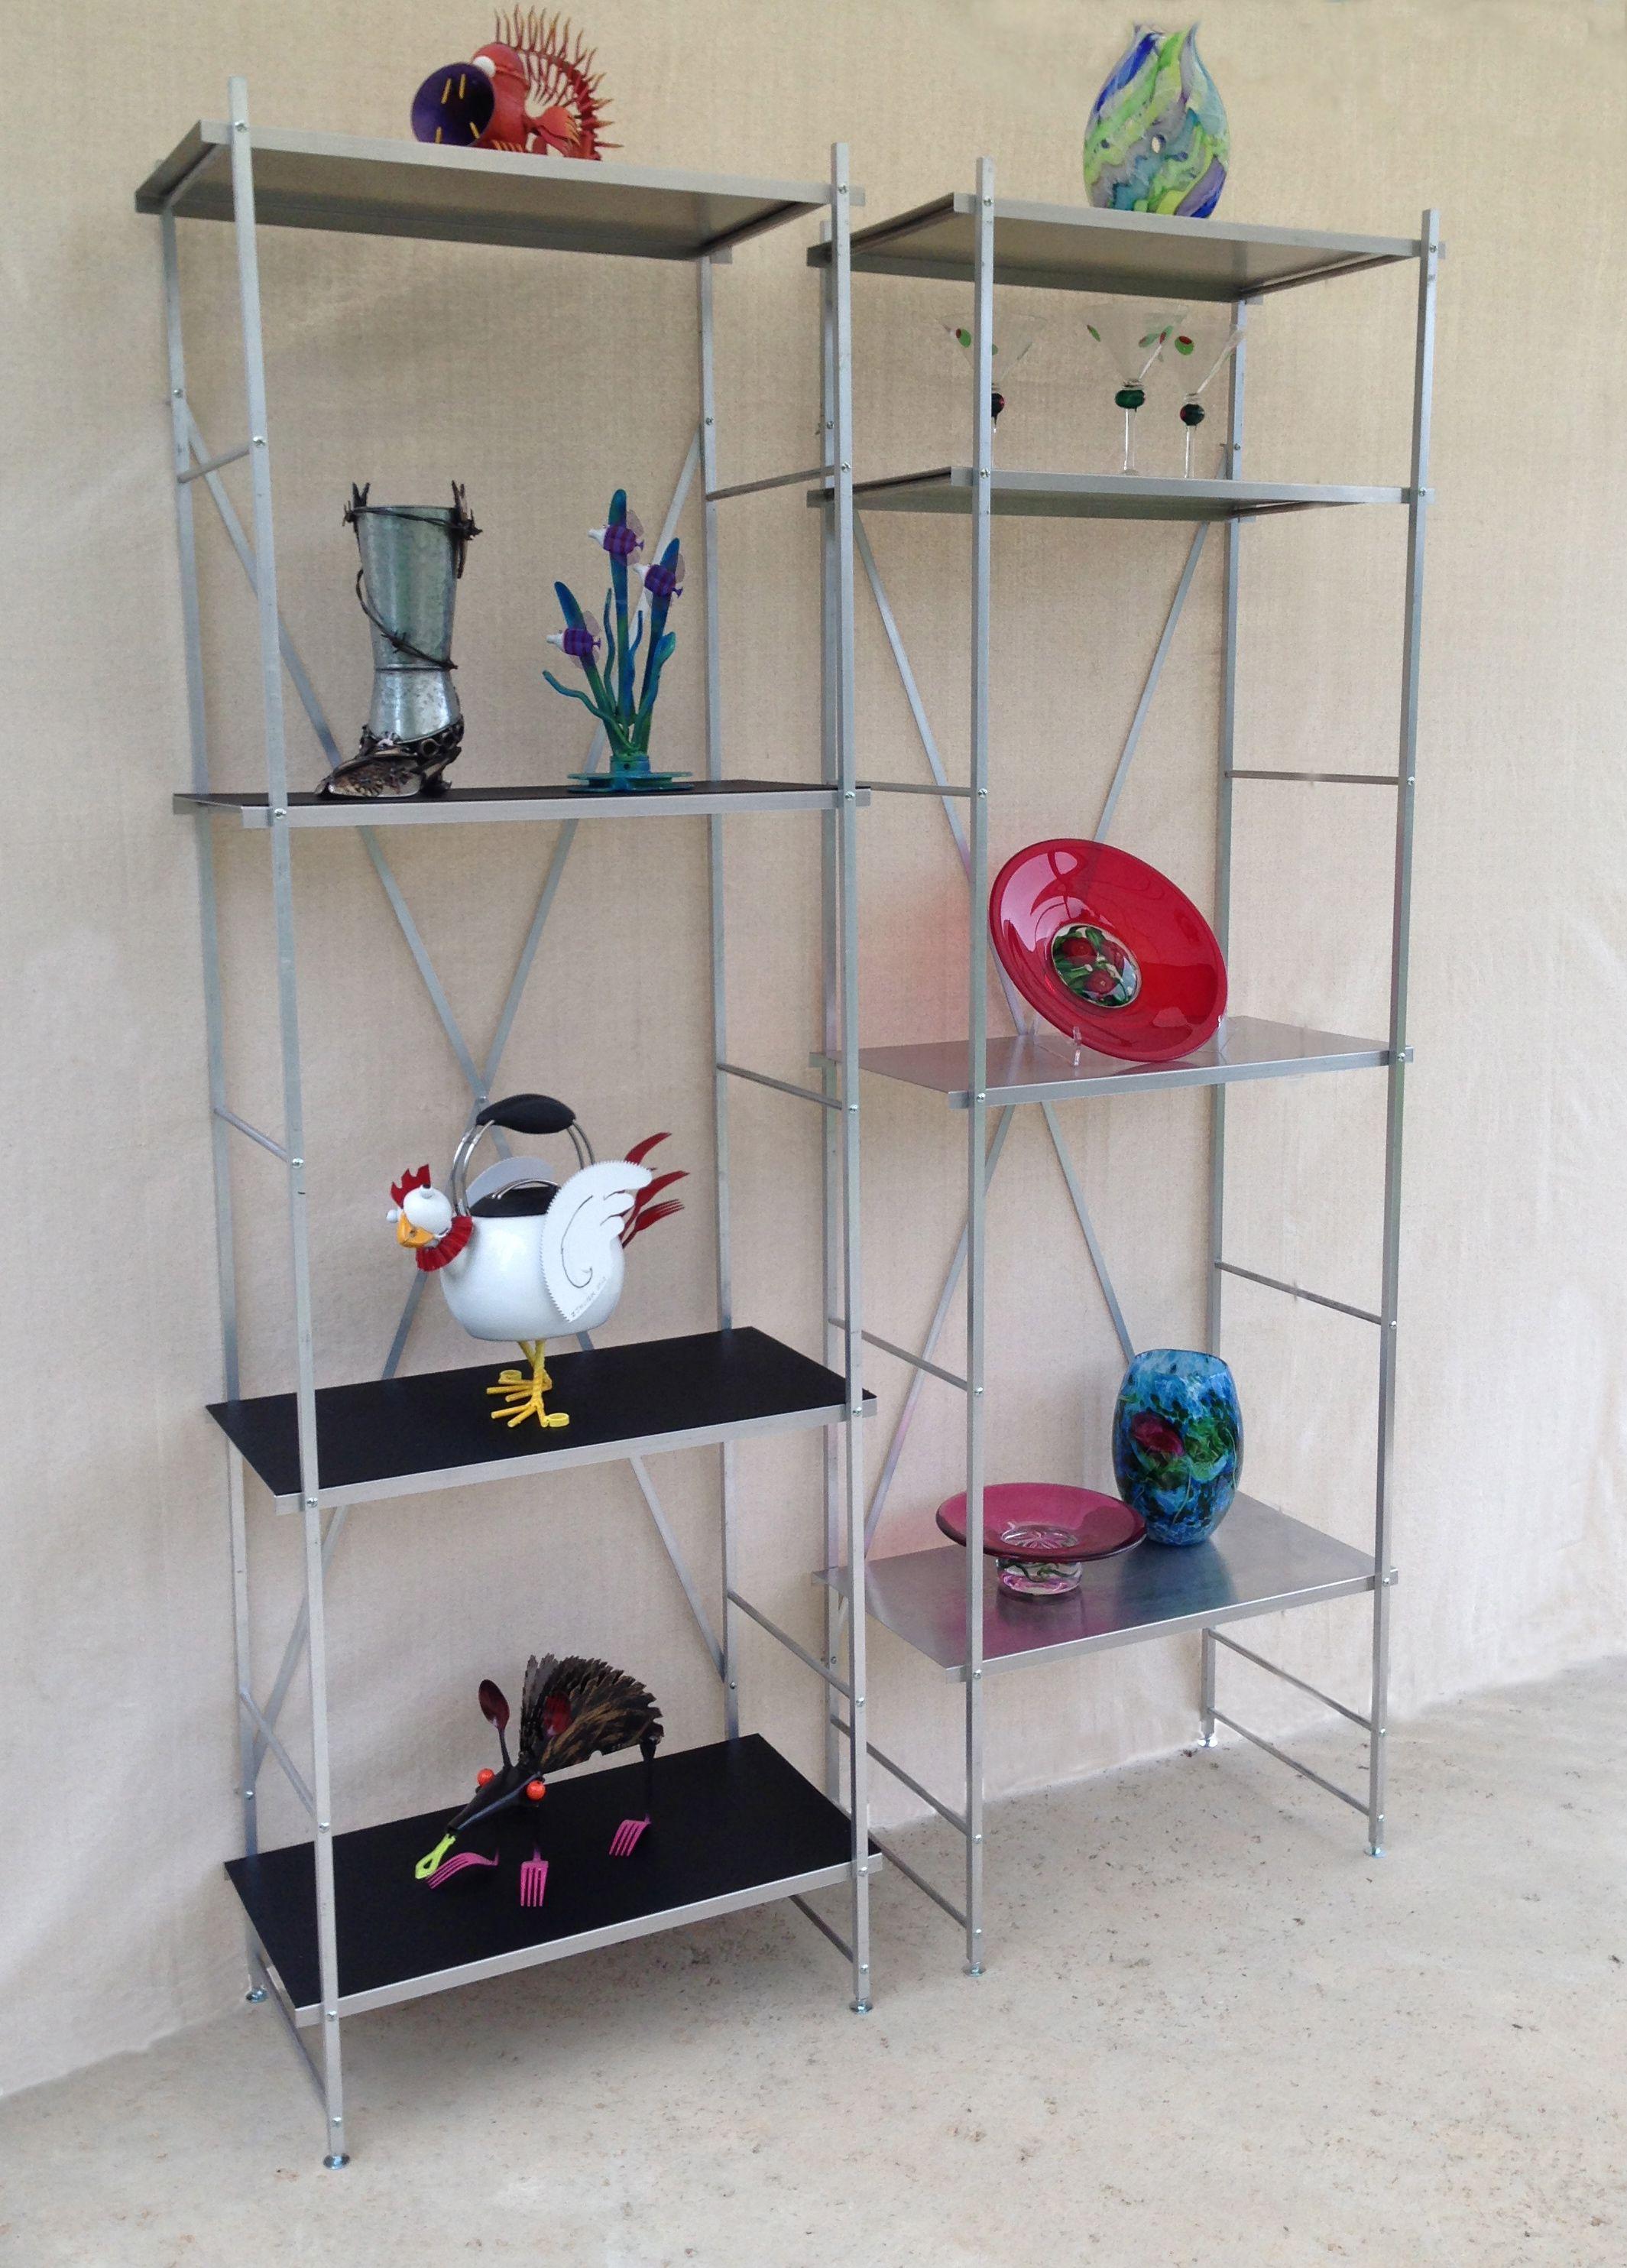 convenience bookcases l collapsible bookcase metal folding amazoncom home casual bookshelf concepts shelf stackable